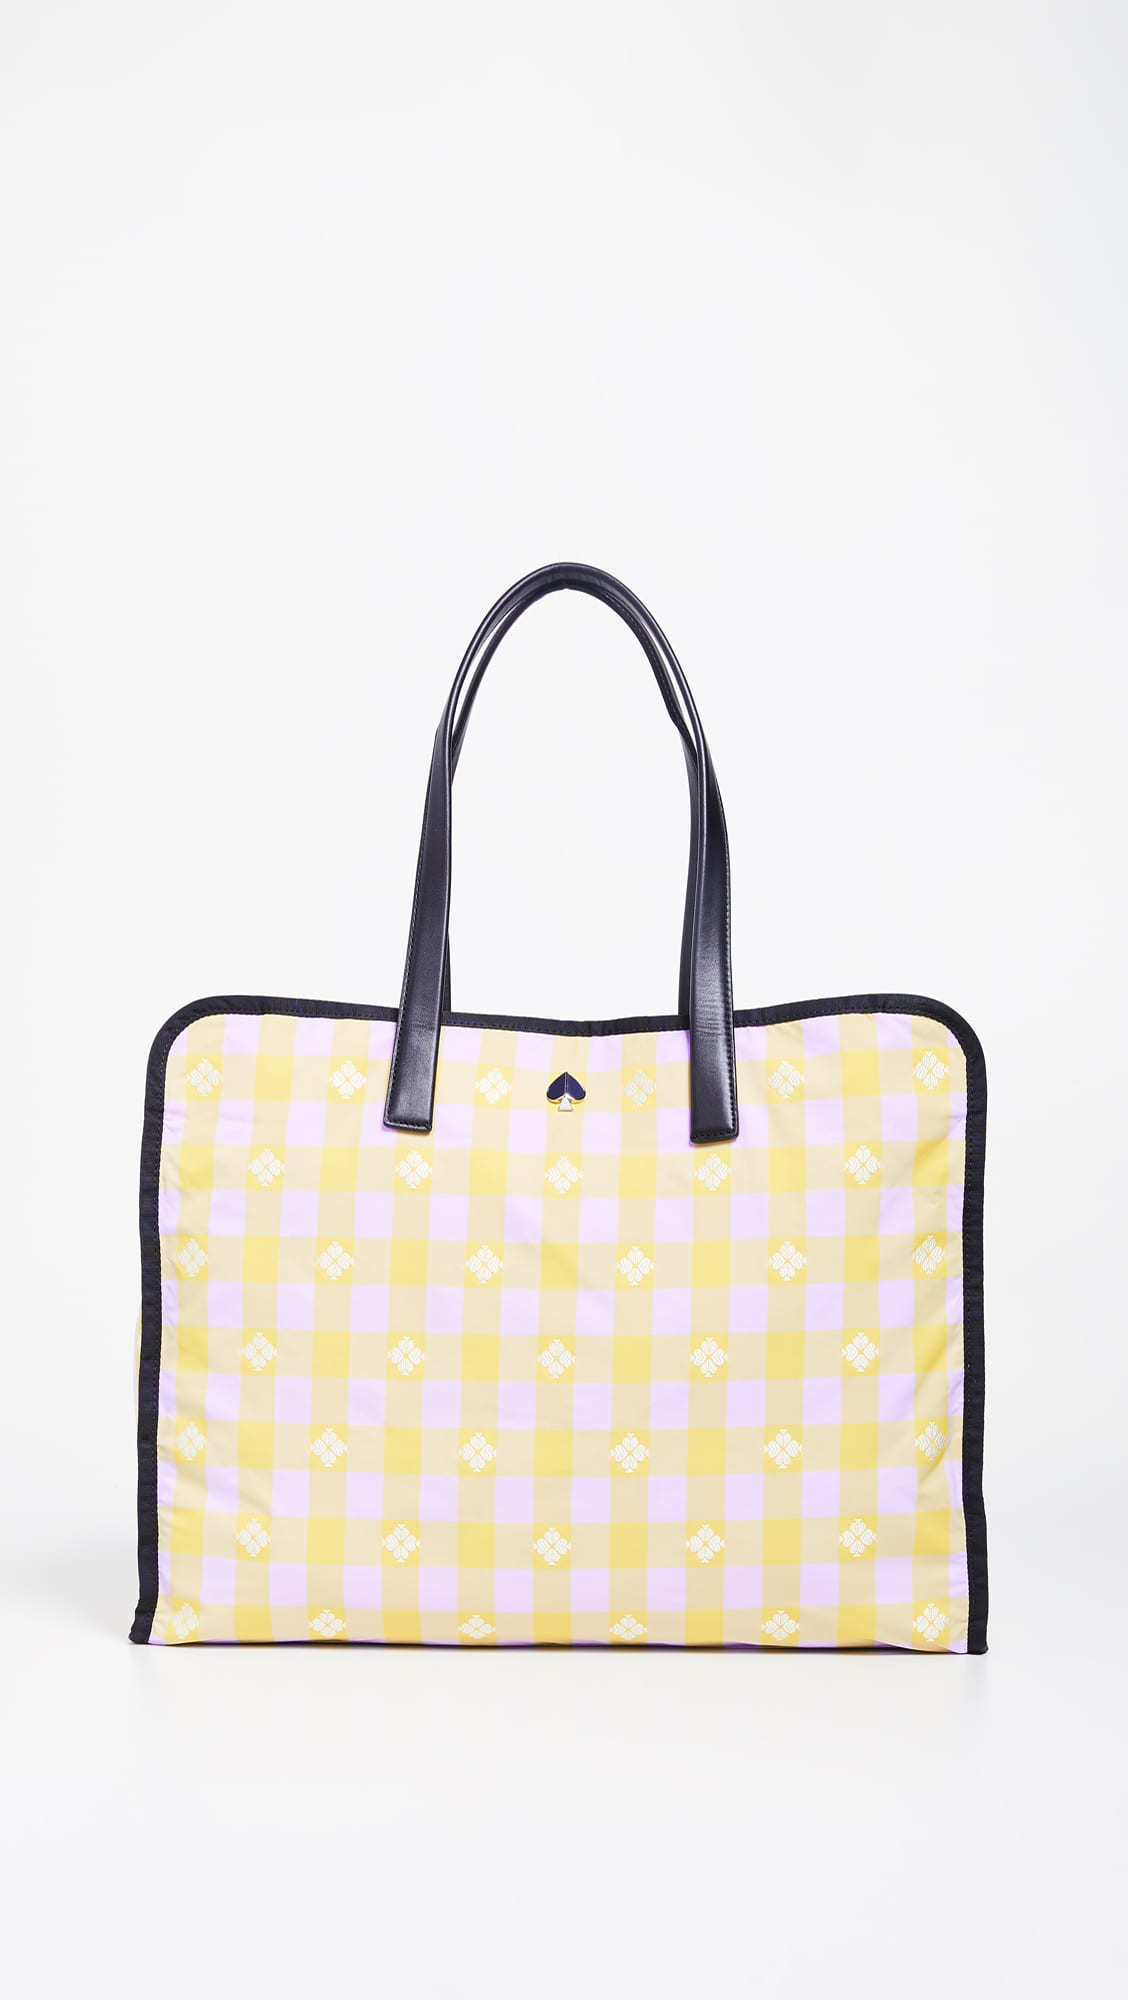 kate spade yellow bag